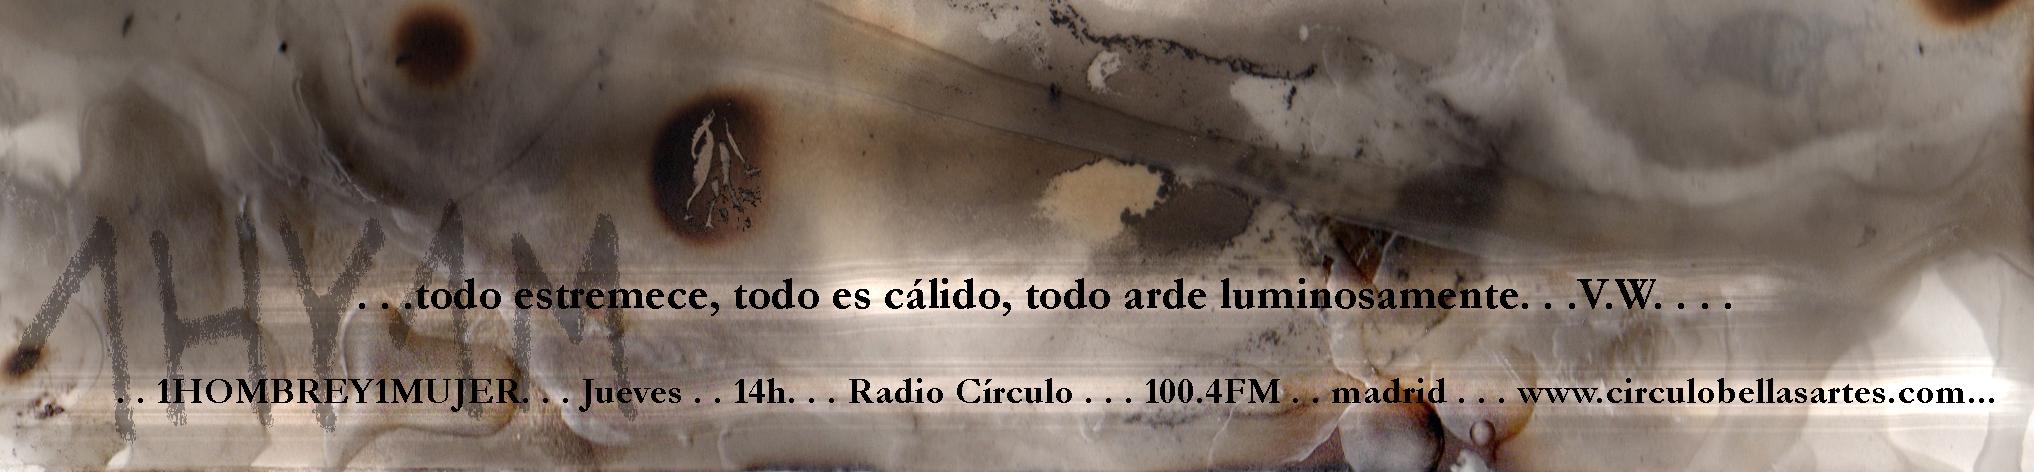 RADIO 1HY1M